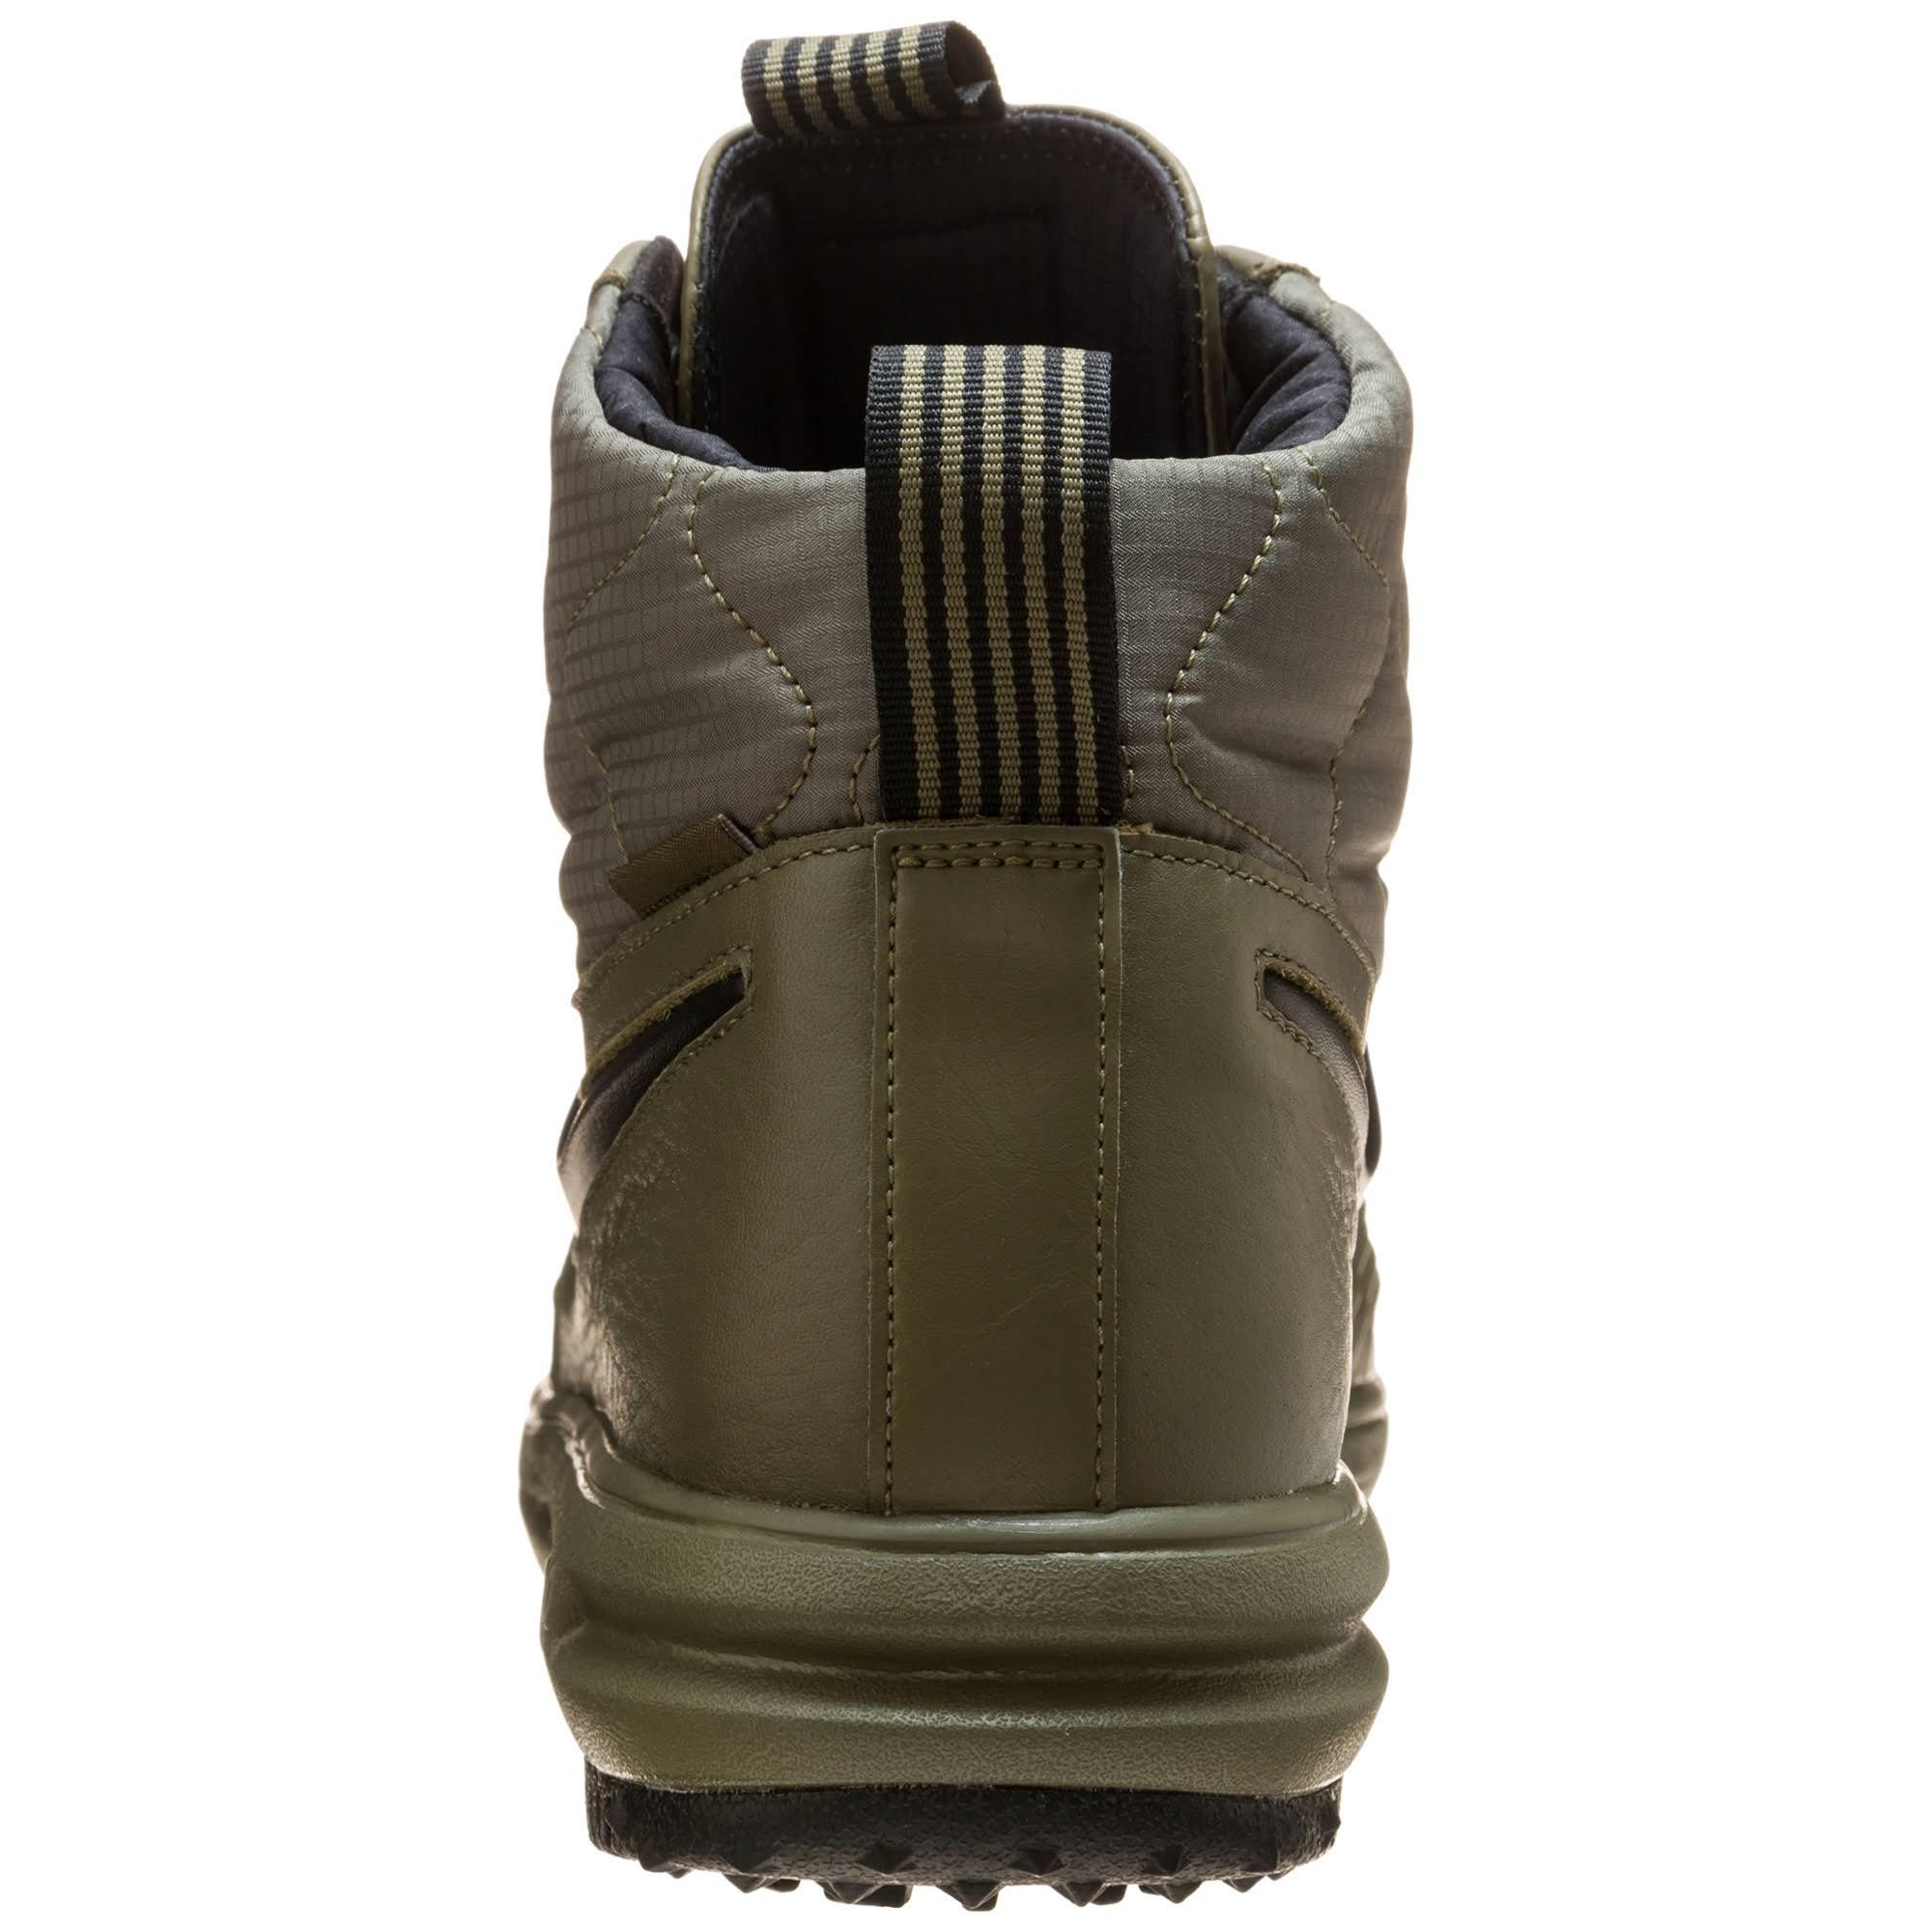 916682 Grün Eu Duckboot Grün 1 41 202 Force '17 Lunar Nike Xq6pwFv